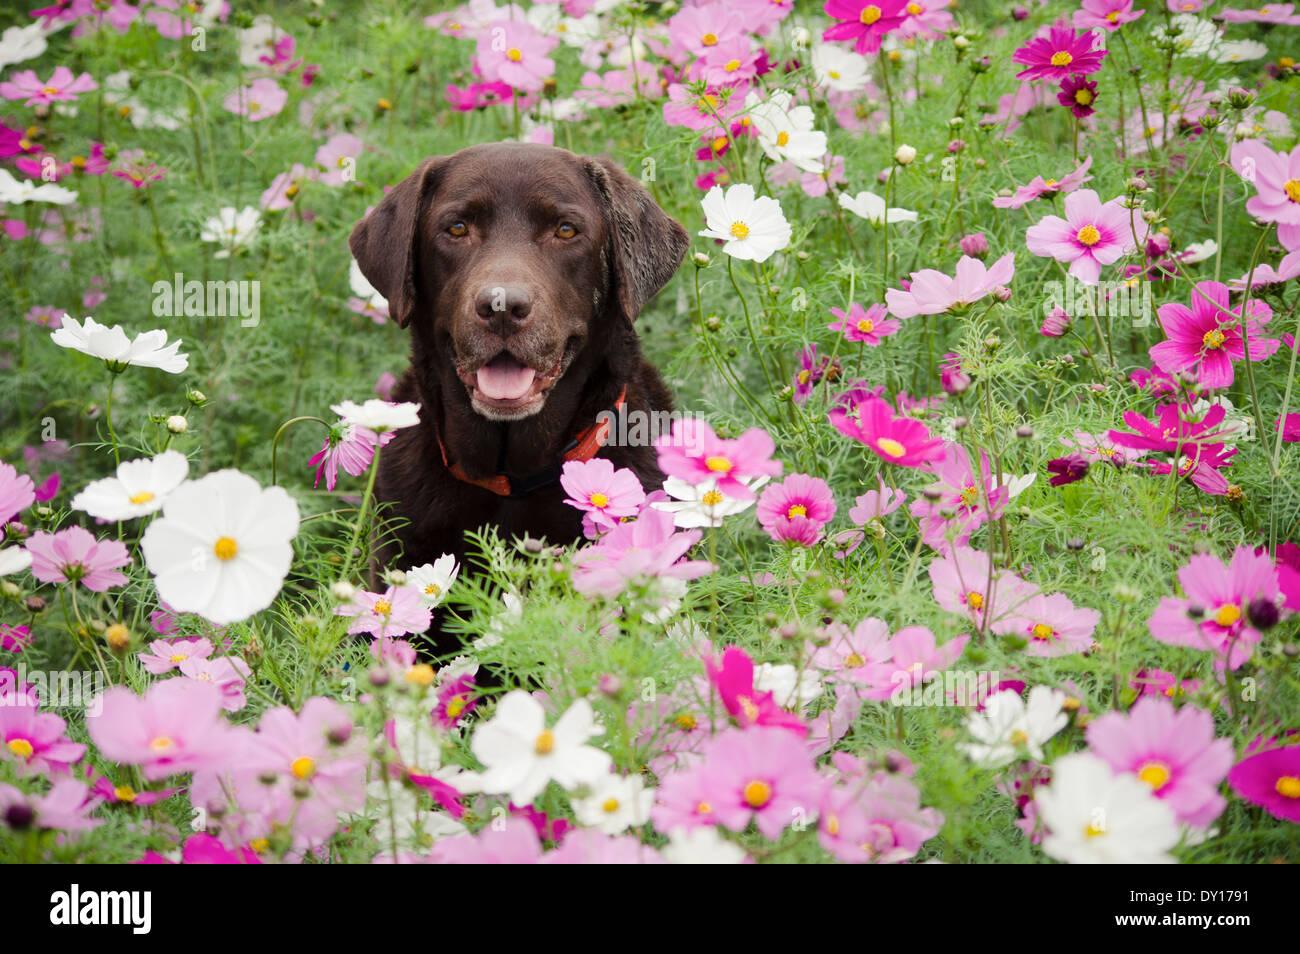 Chocolate Labrador Retriever in a field of cosmos flowers - Stock Image